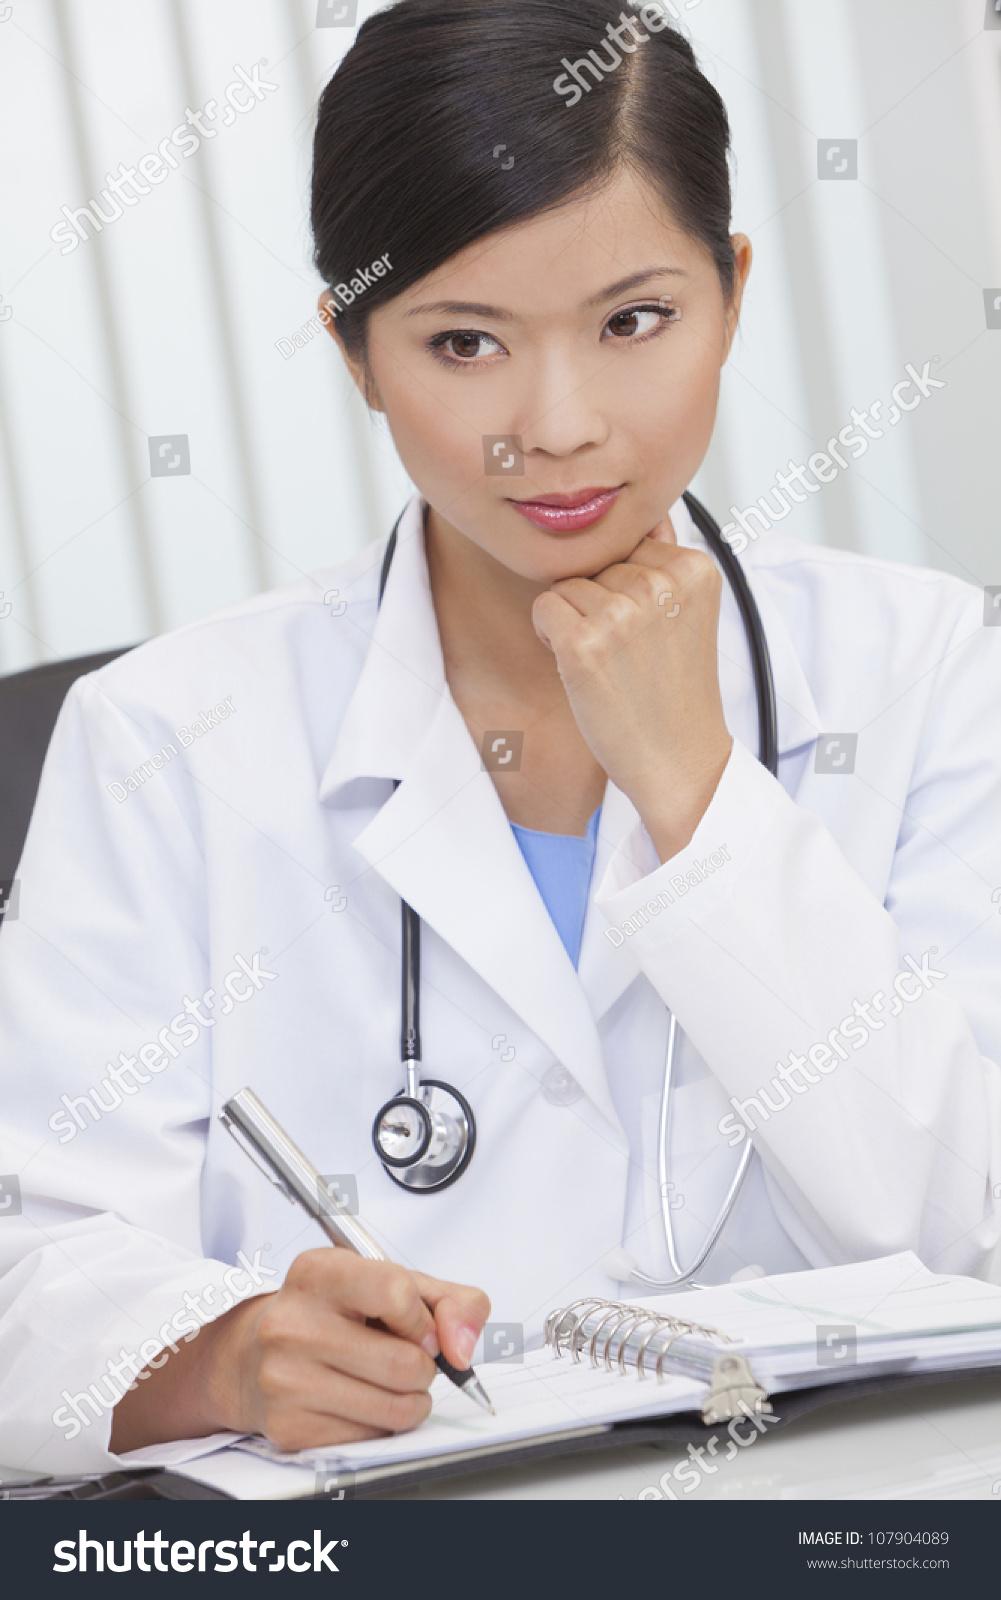 Video! asian medical hospital